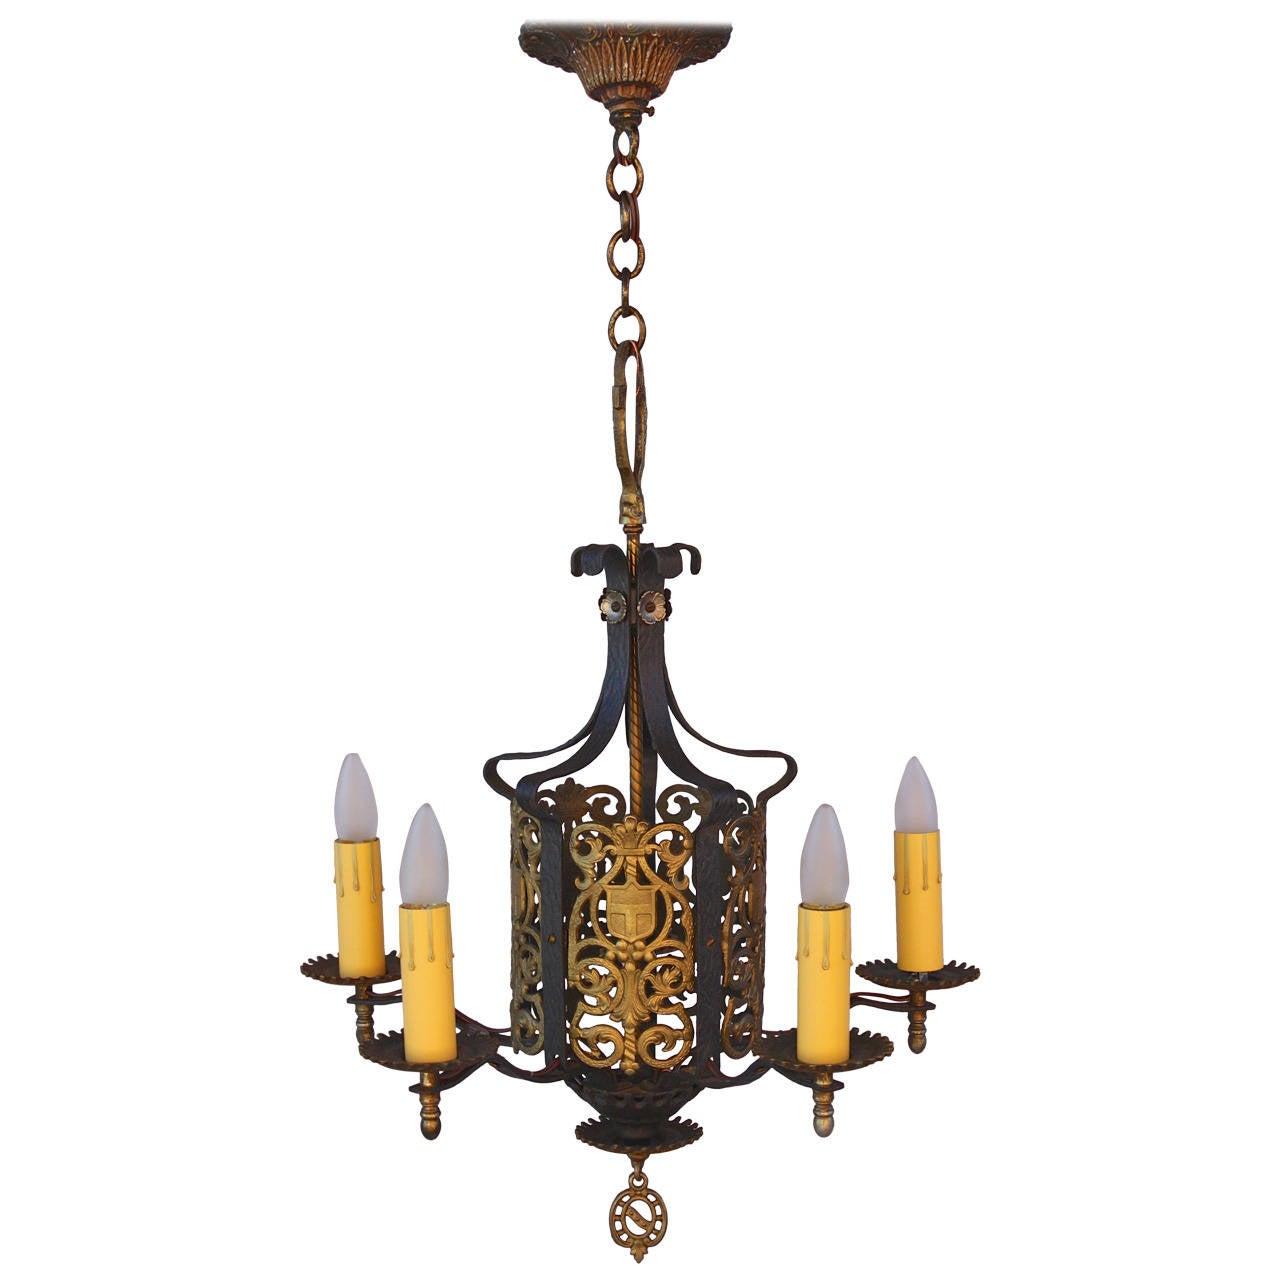 Items Similar To Lighting Rustic Chandelier Vintage 1920 S: Striking 1920s Cast Five-Light Chandelier For Sale At 1stdibs